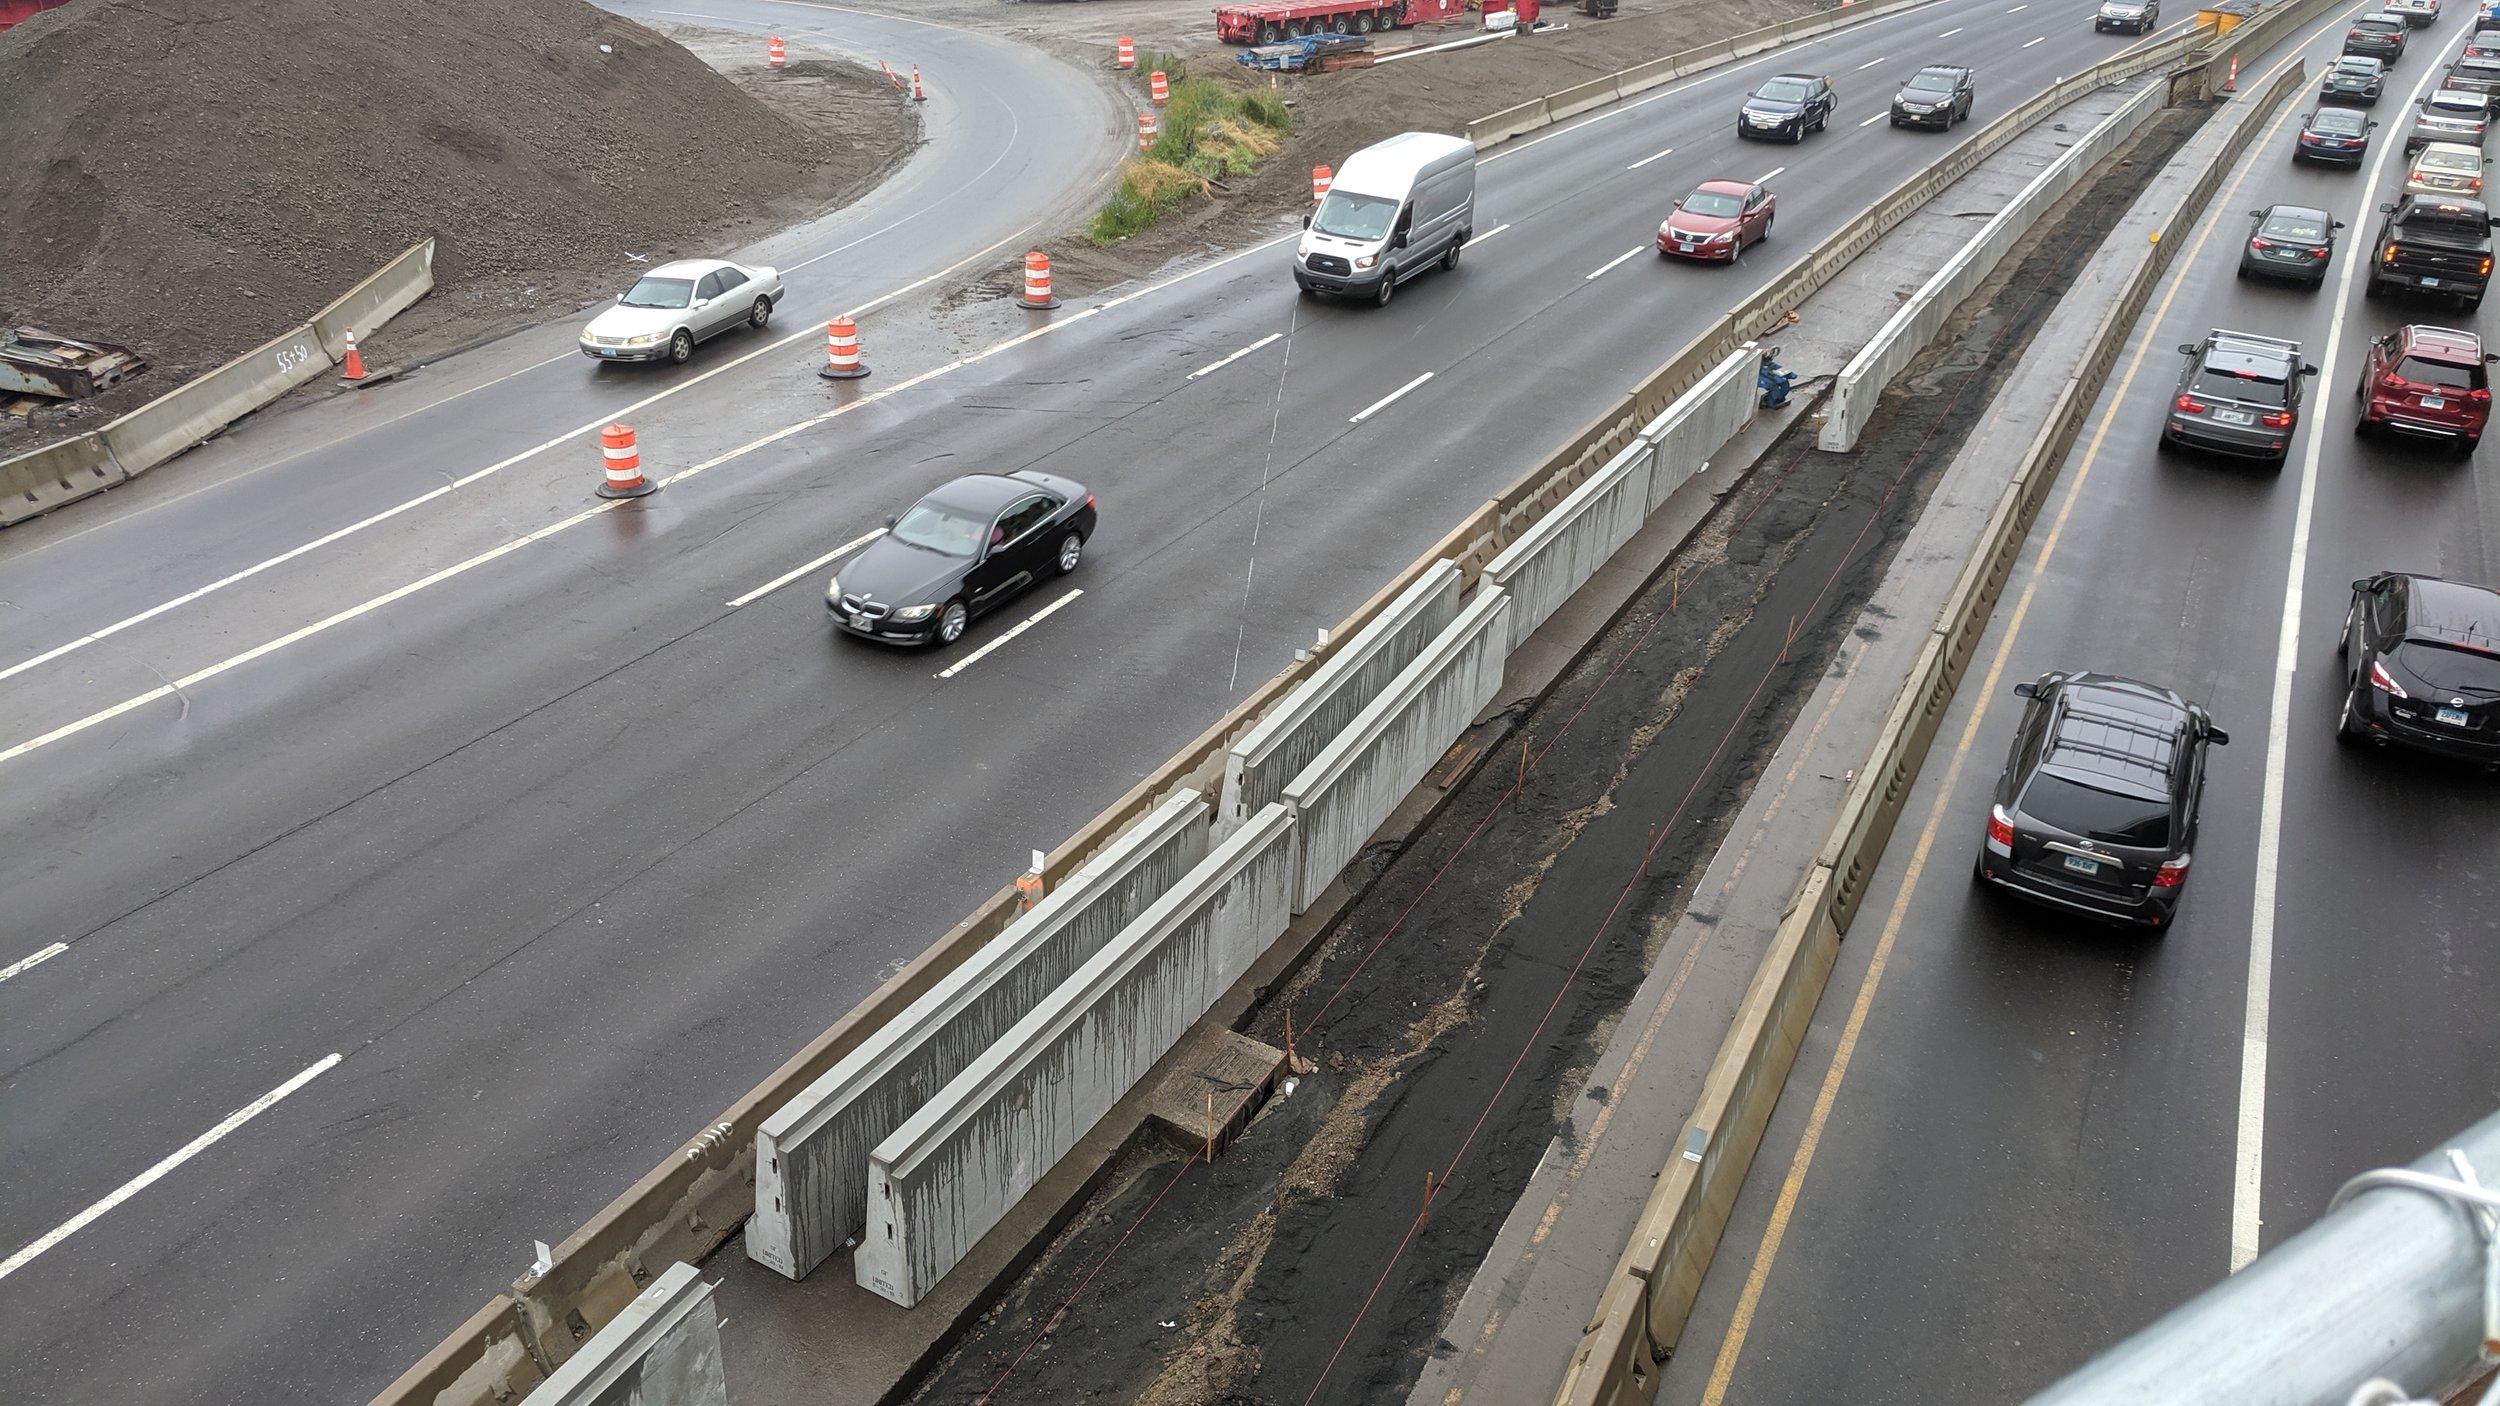 The replacement of median barrier in progress.  Taken on 6/20/19 by Jonathan Wu